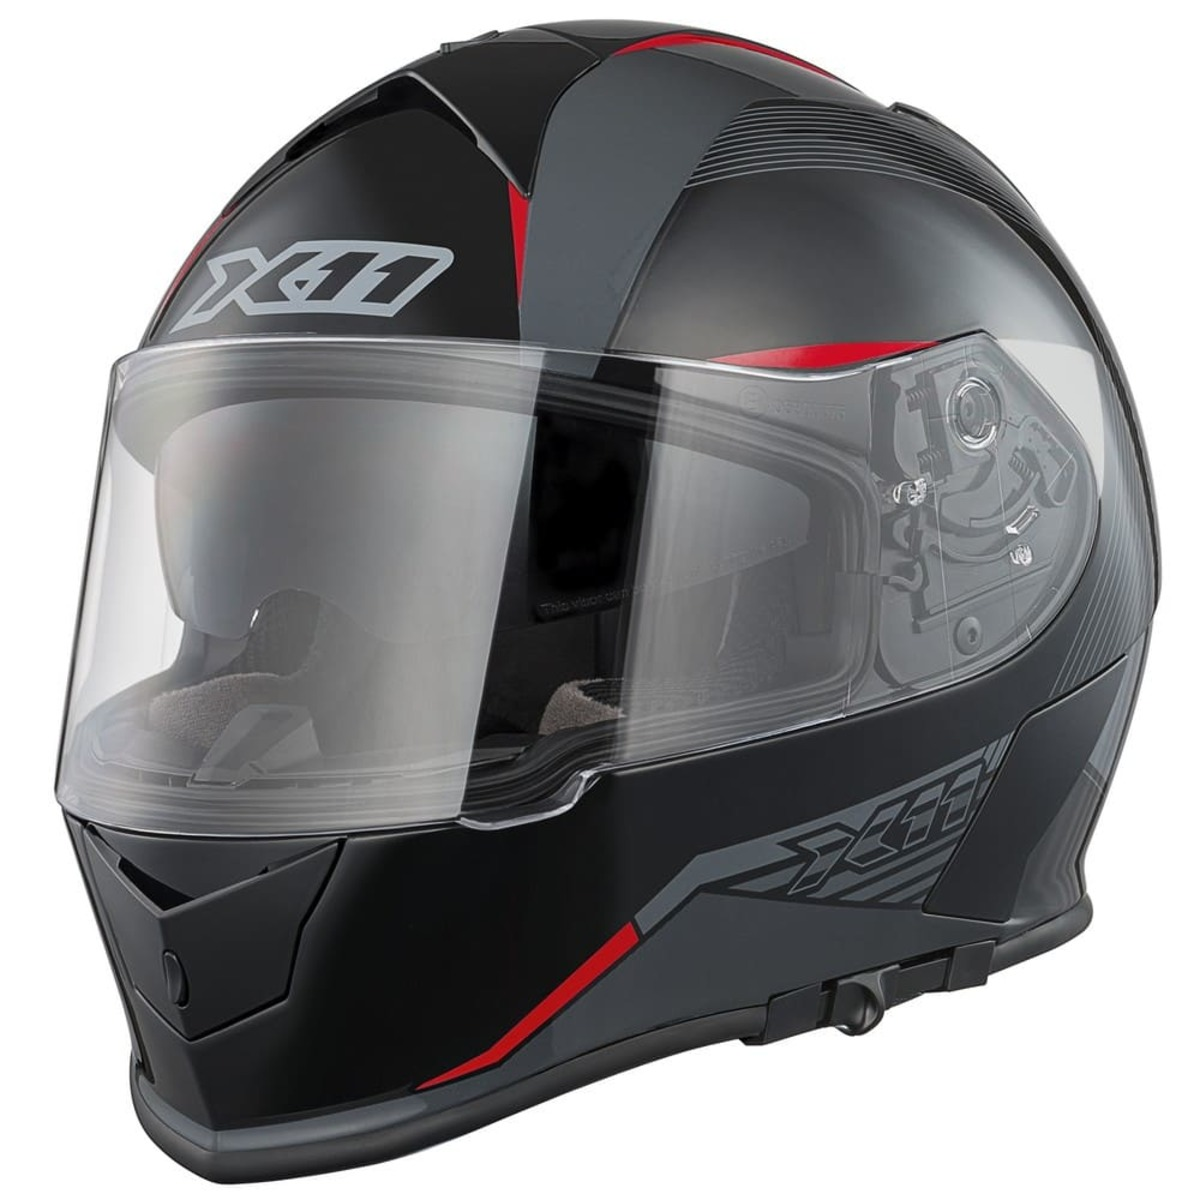 Capacete X11 Revo SV Integral Moto Motociclista Vermelho